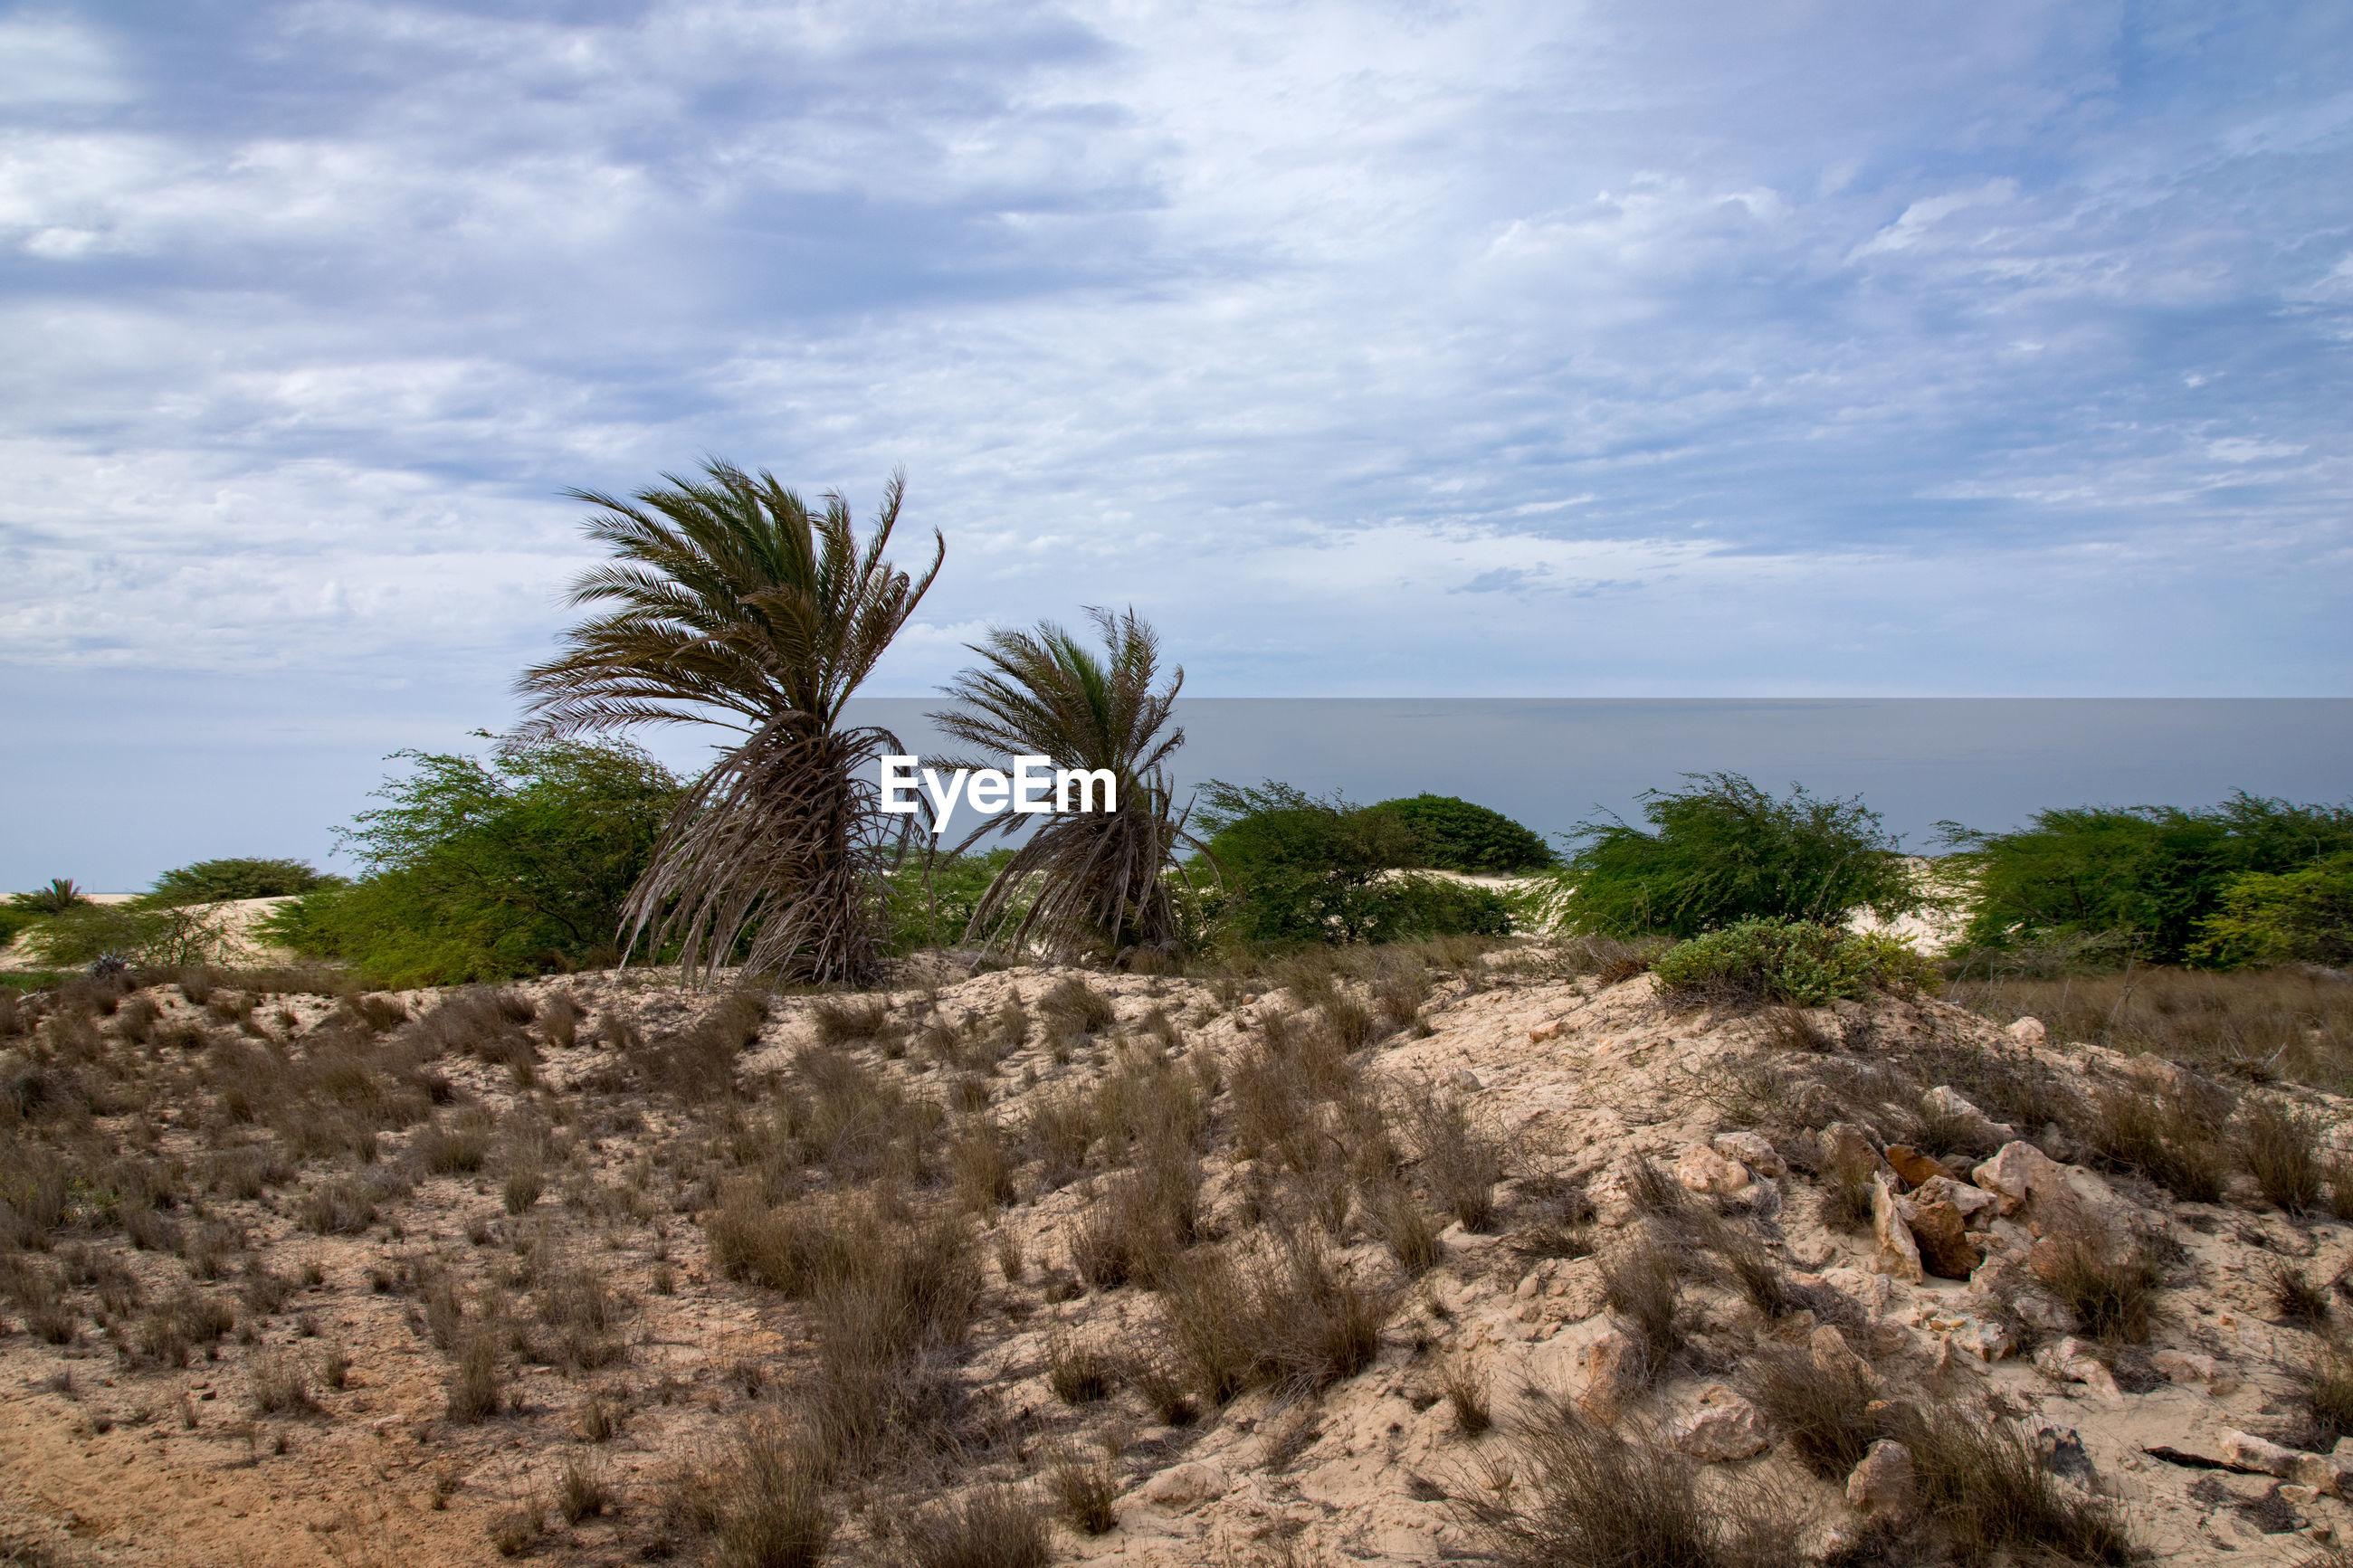 Arid and desert environment of boa vista, cape verde